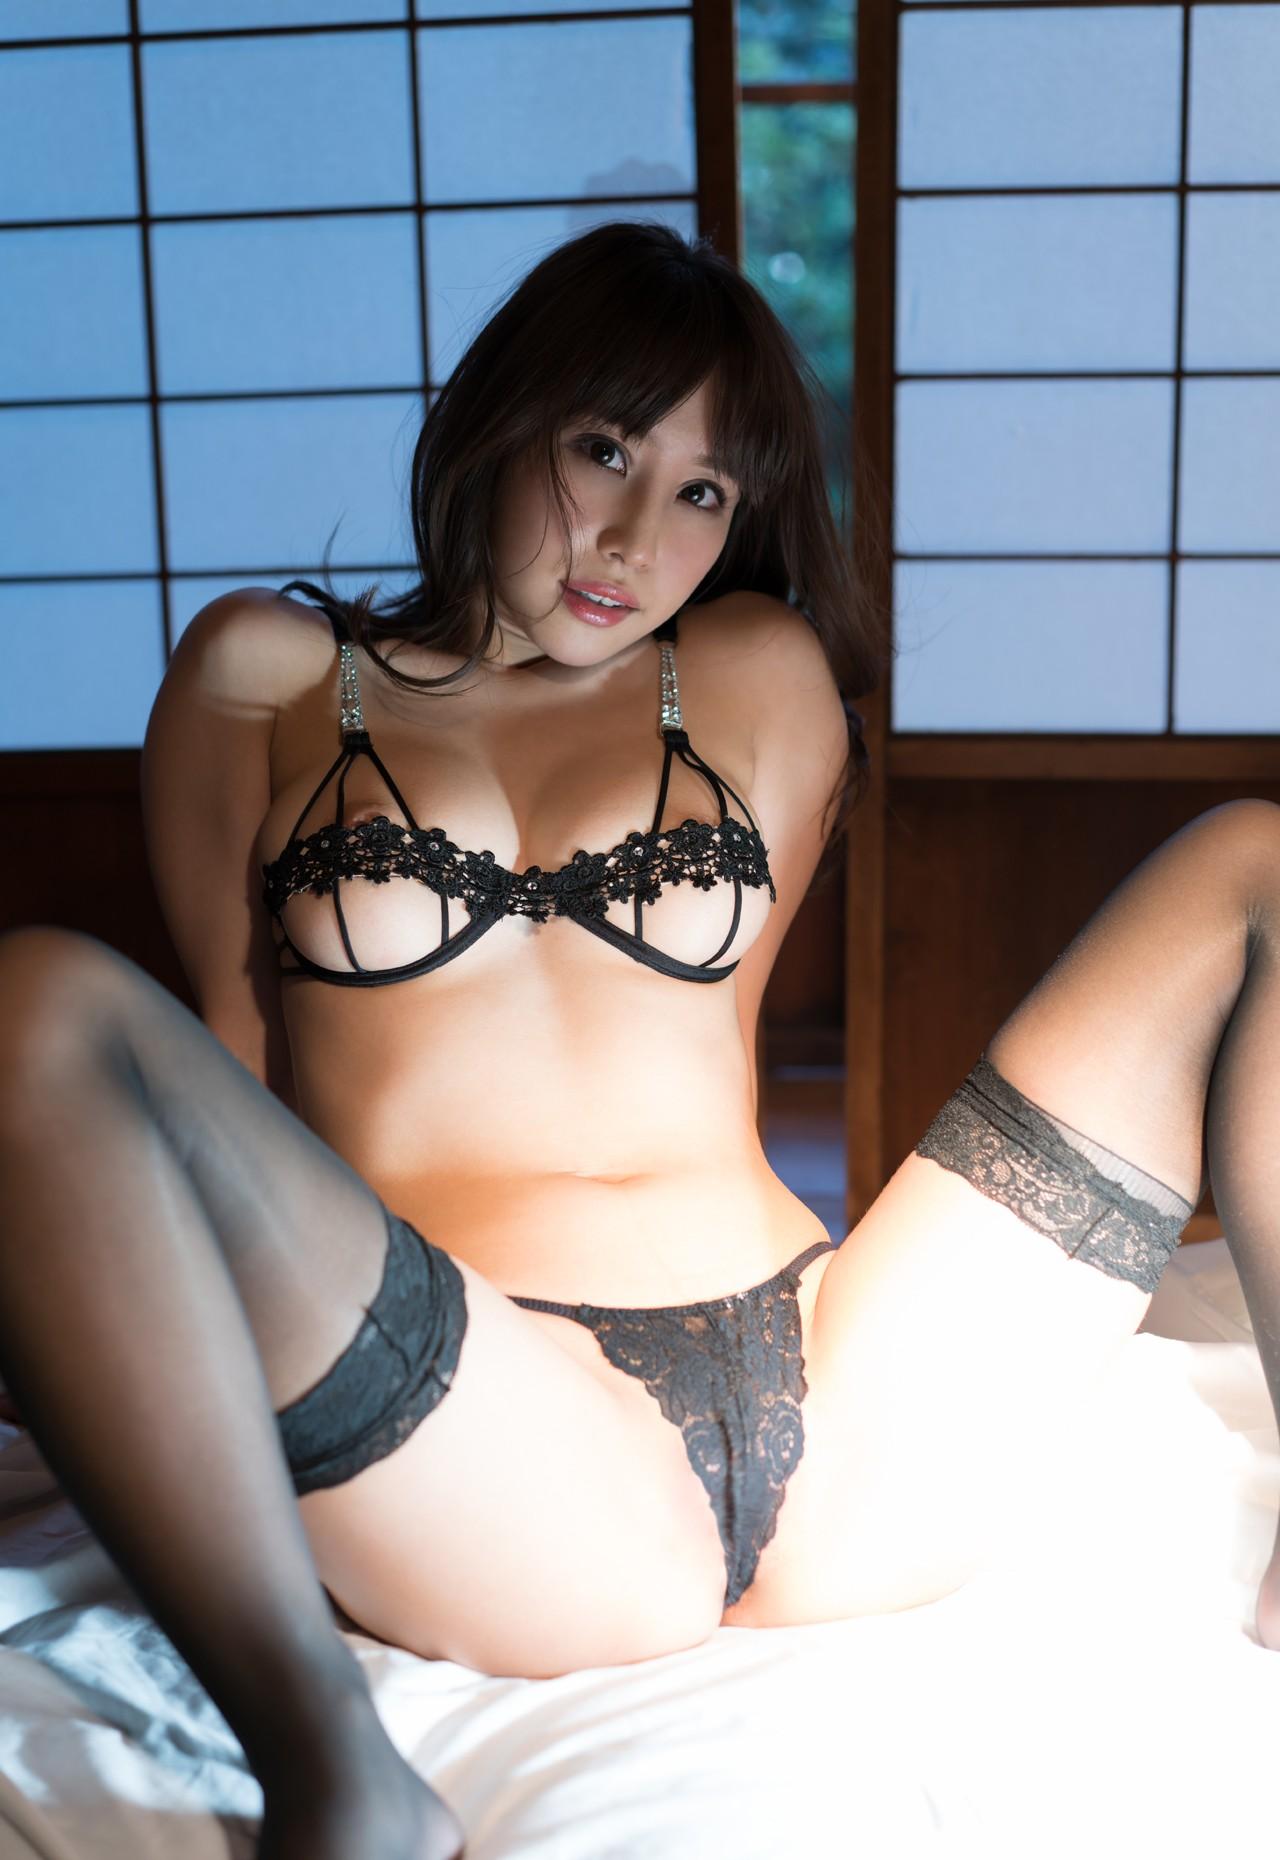 Hot asian women lingerie